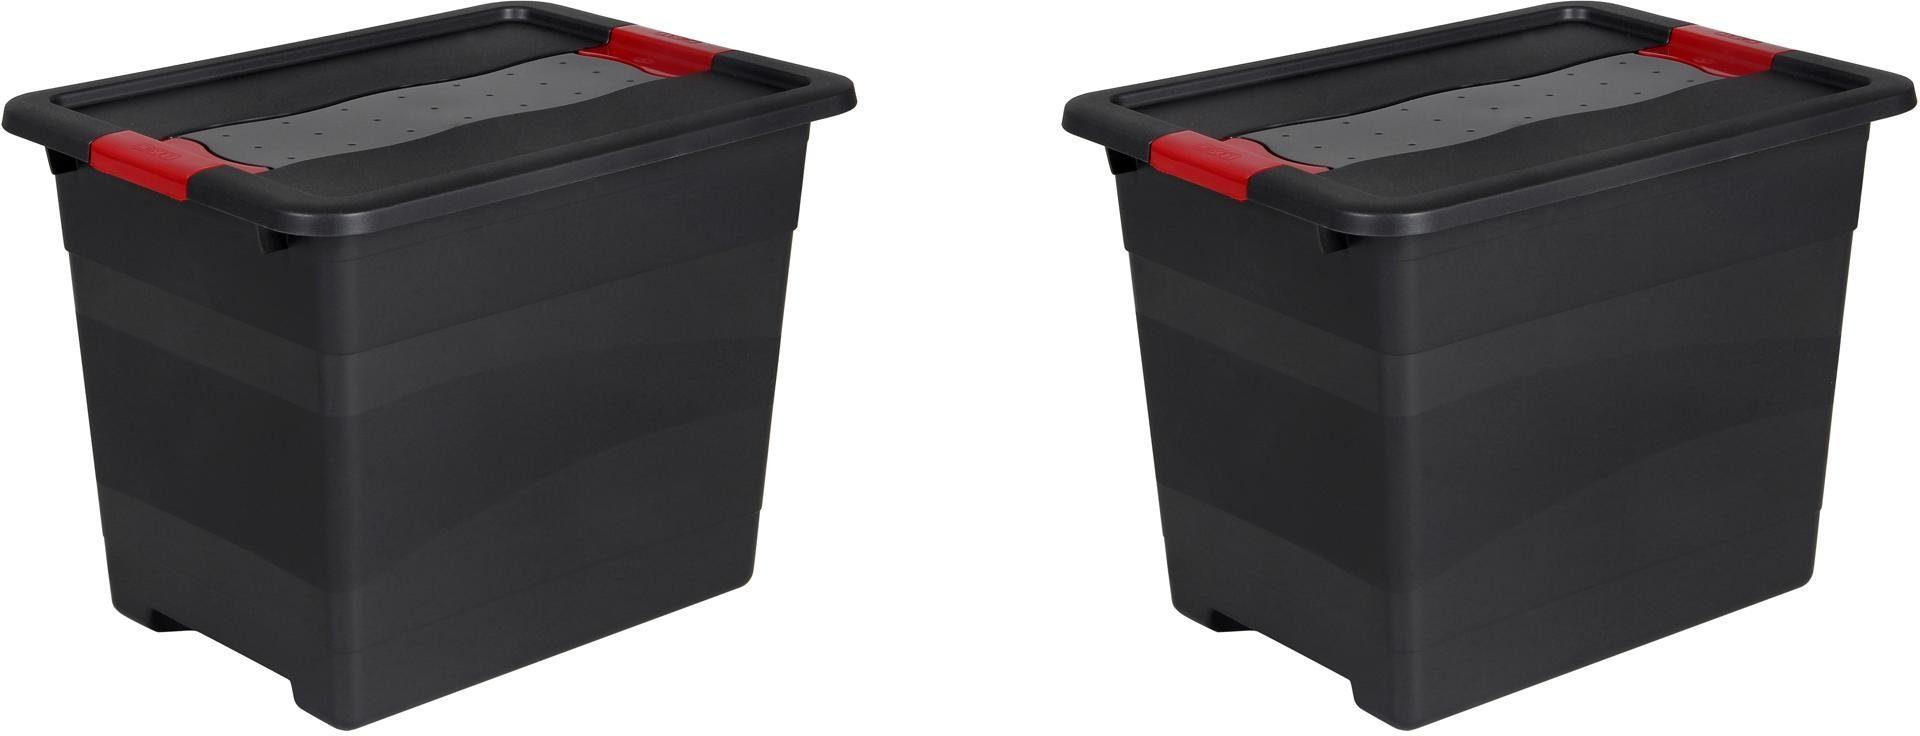 keeeper Transportbehälter mit Deckel, 39,5 x 39,5 x 30 cm, 24 Liter, 2er Set, »eckhart«